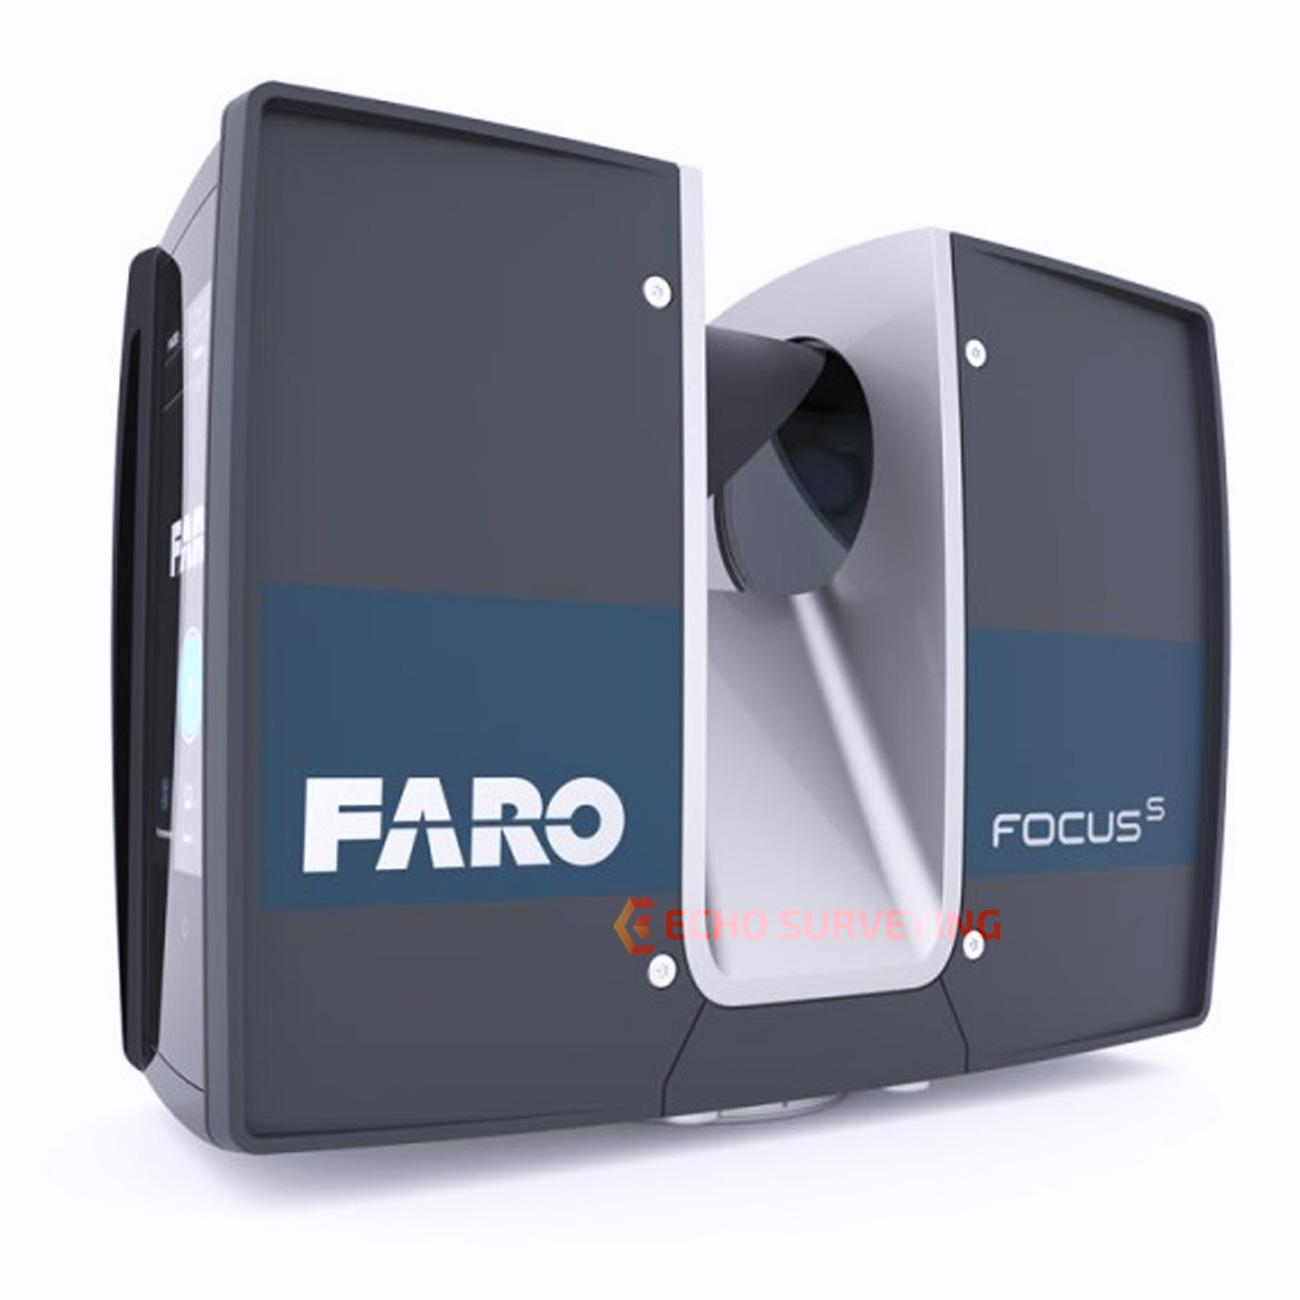 Faro-Focus-S70-for-sale.jpg